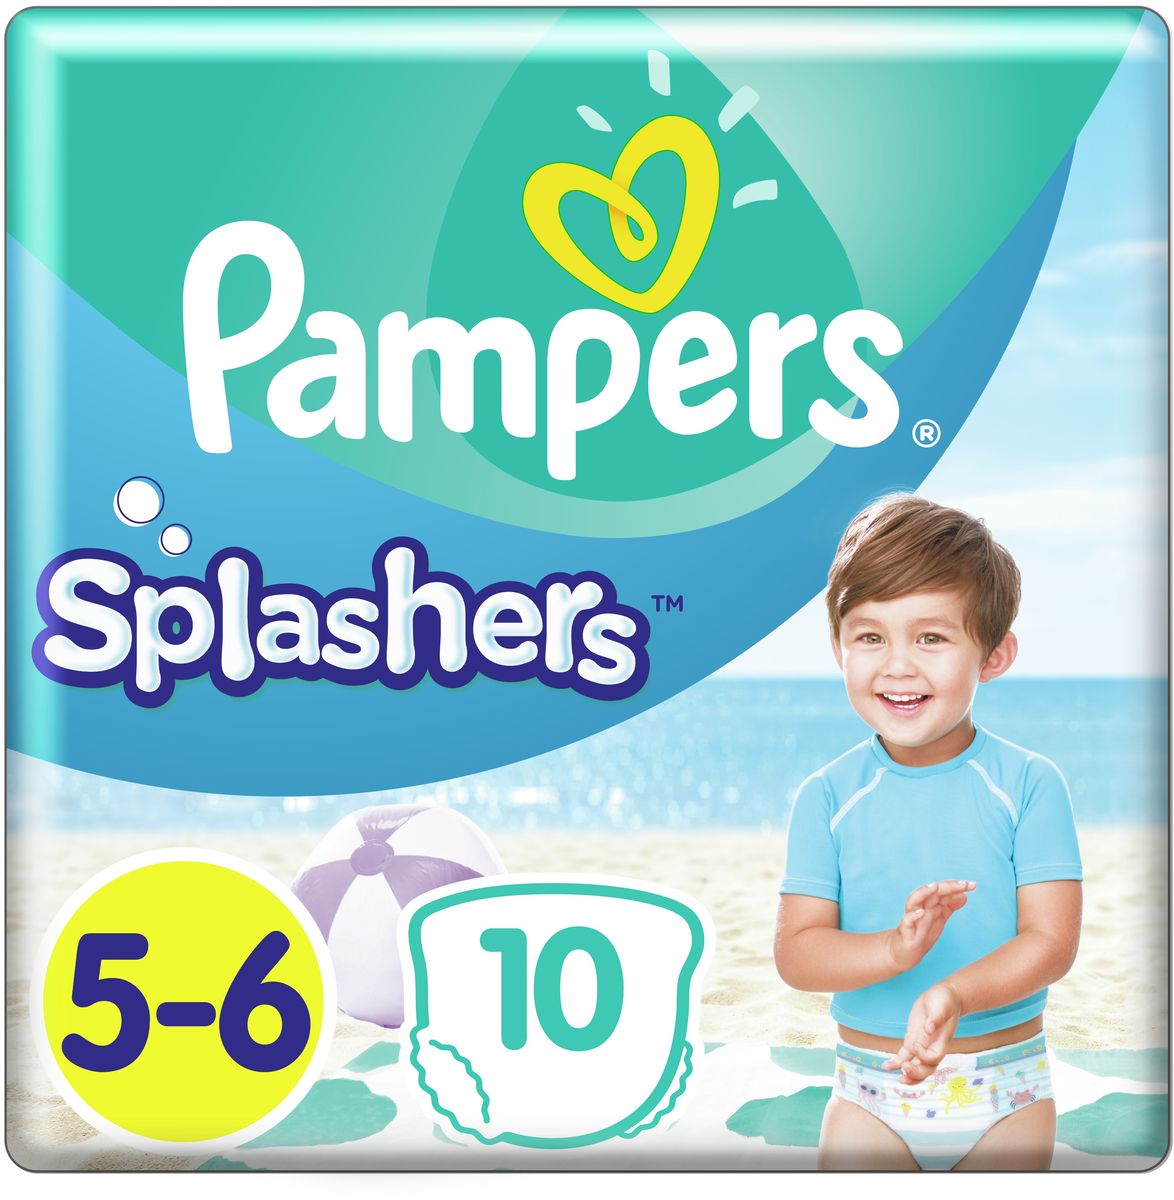 Pampers Трусики для плавания Splashers 15 кг+ (размер 5-6) 10 шт трусики подгузники pampers splashers для плавания maxi junior 9 15 кг 11 шт